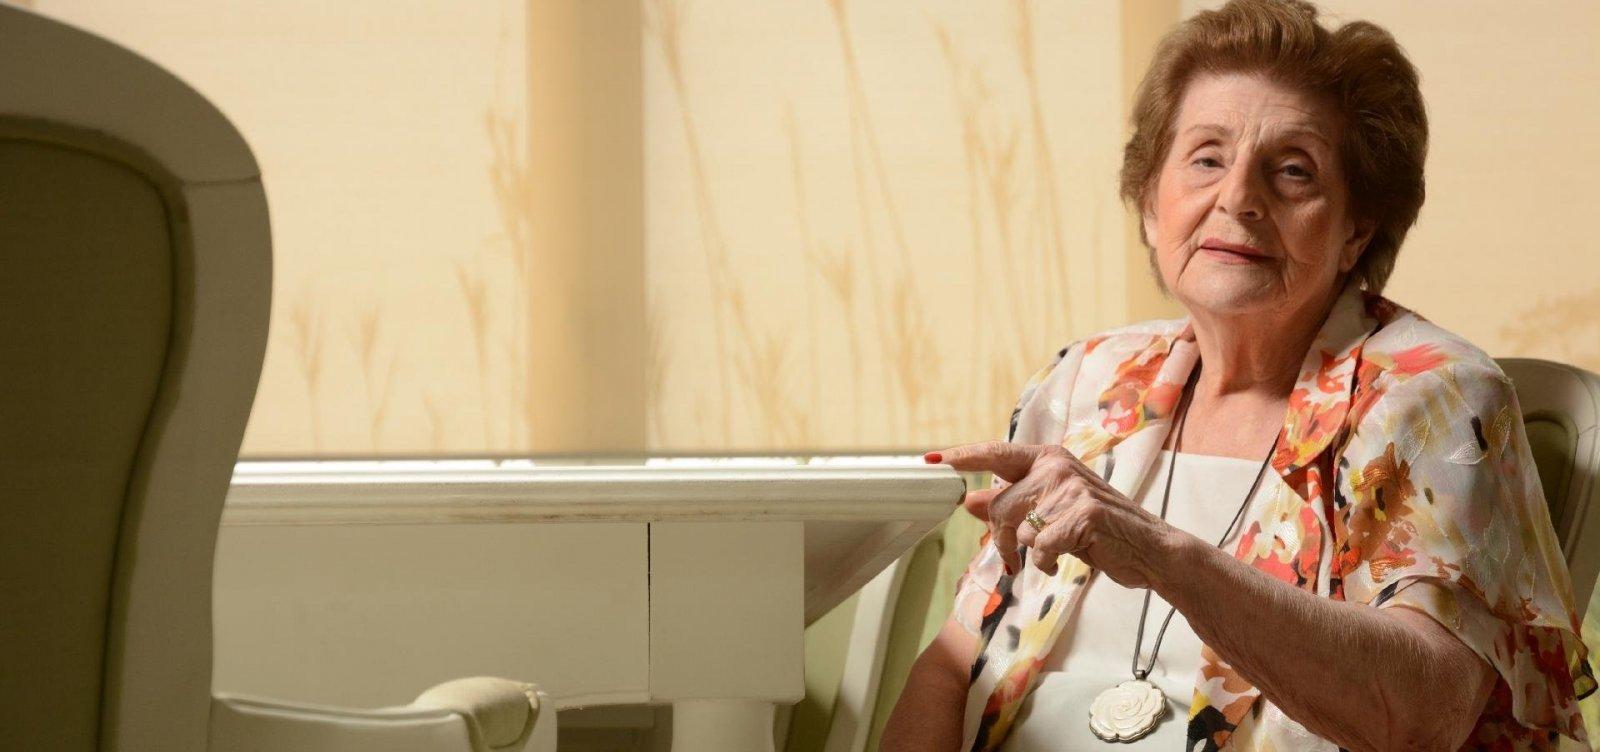 [Aos 92 anos, morre a escritora espiritualista Zibia Gasparetto]